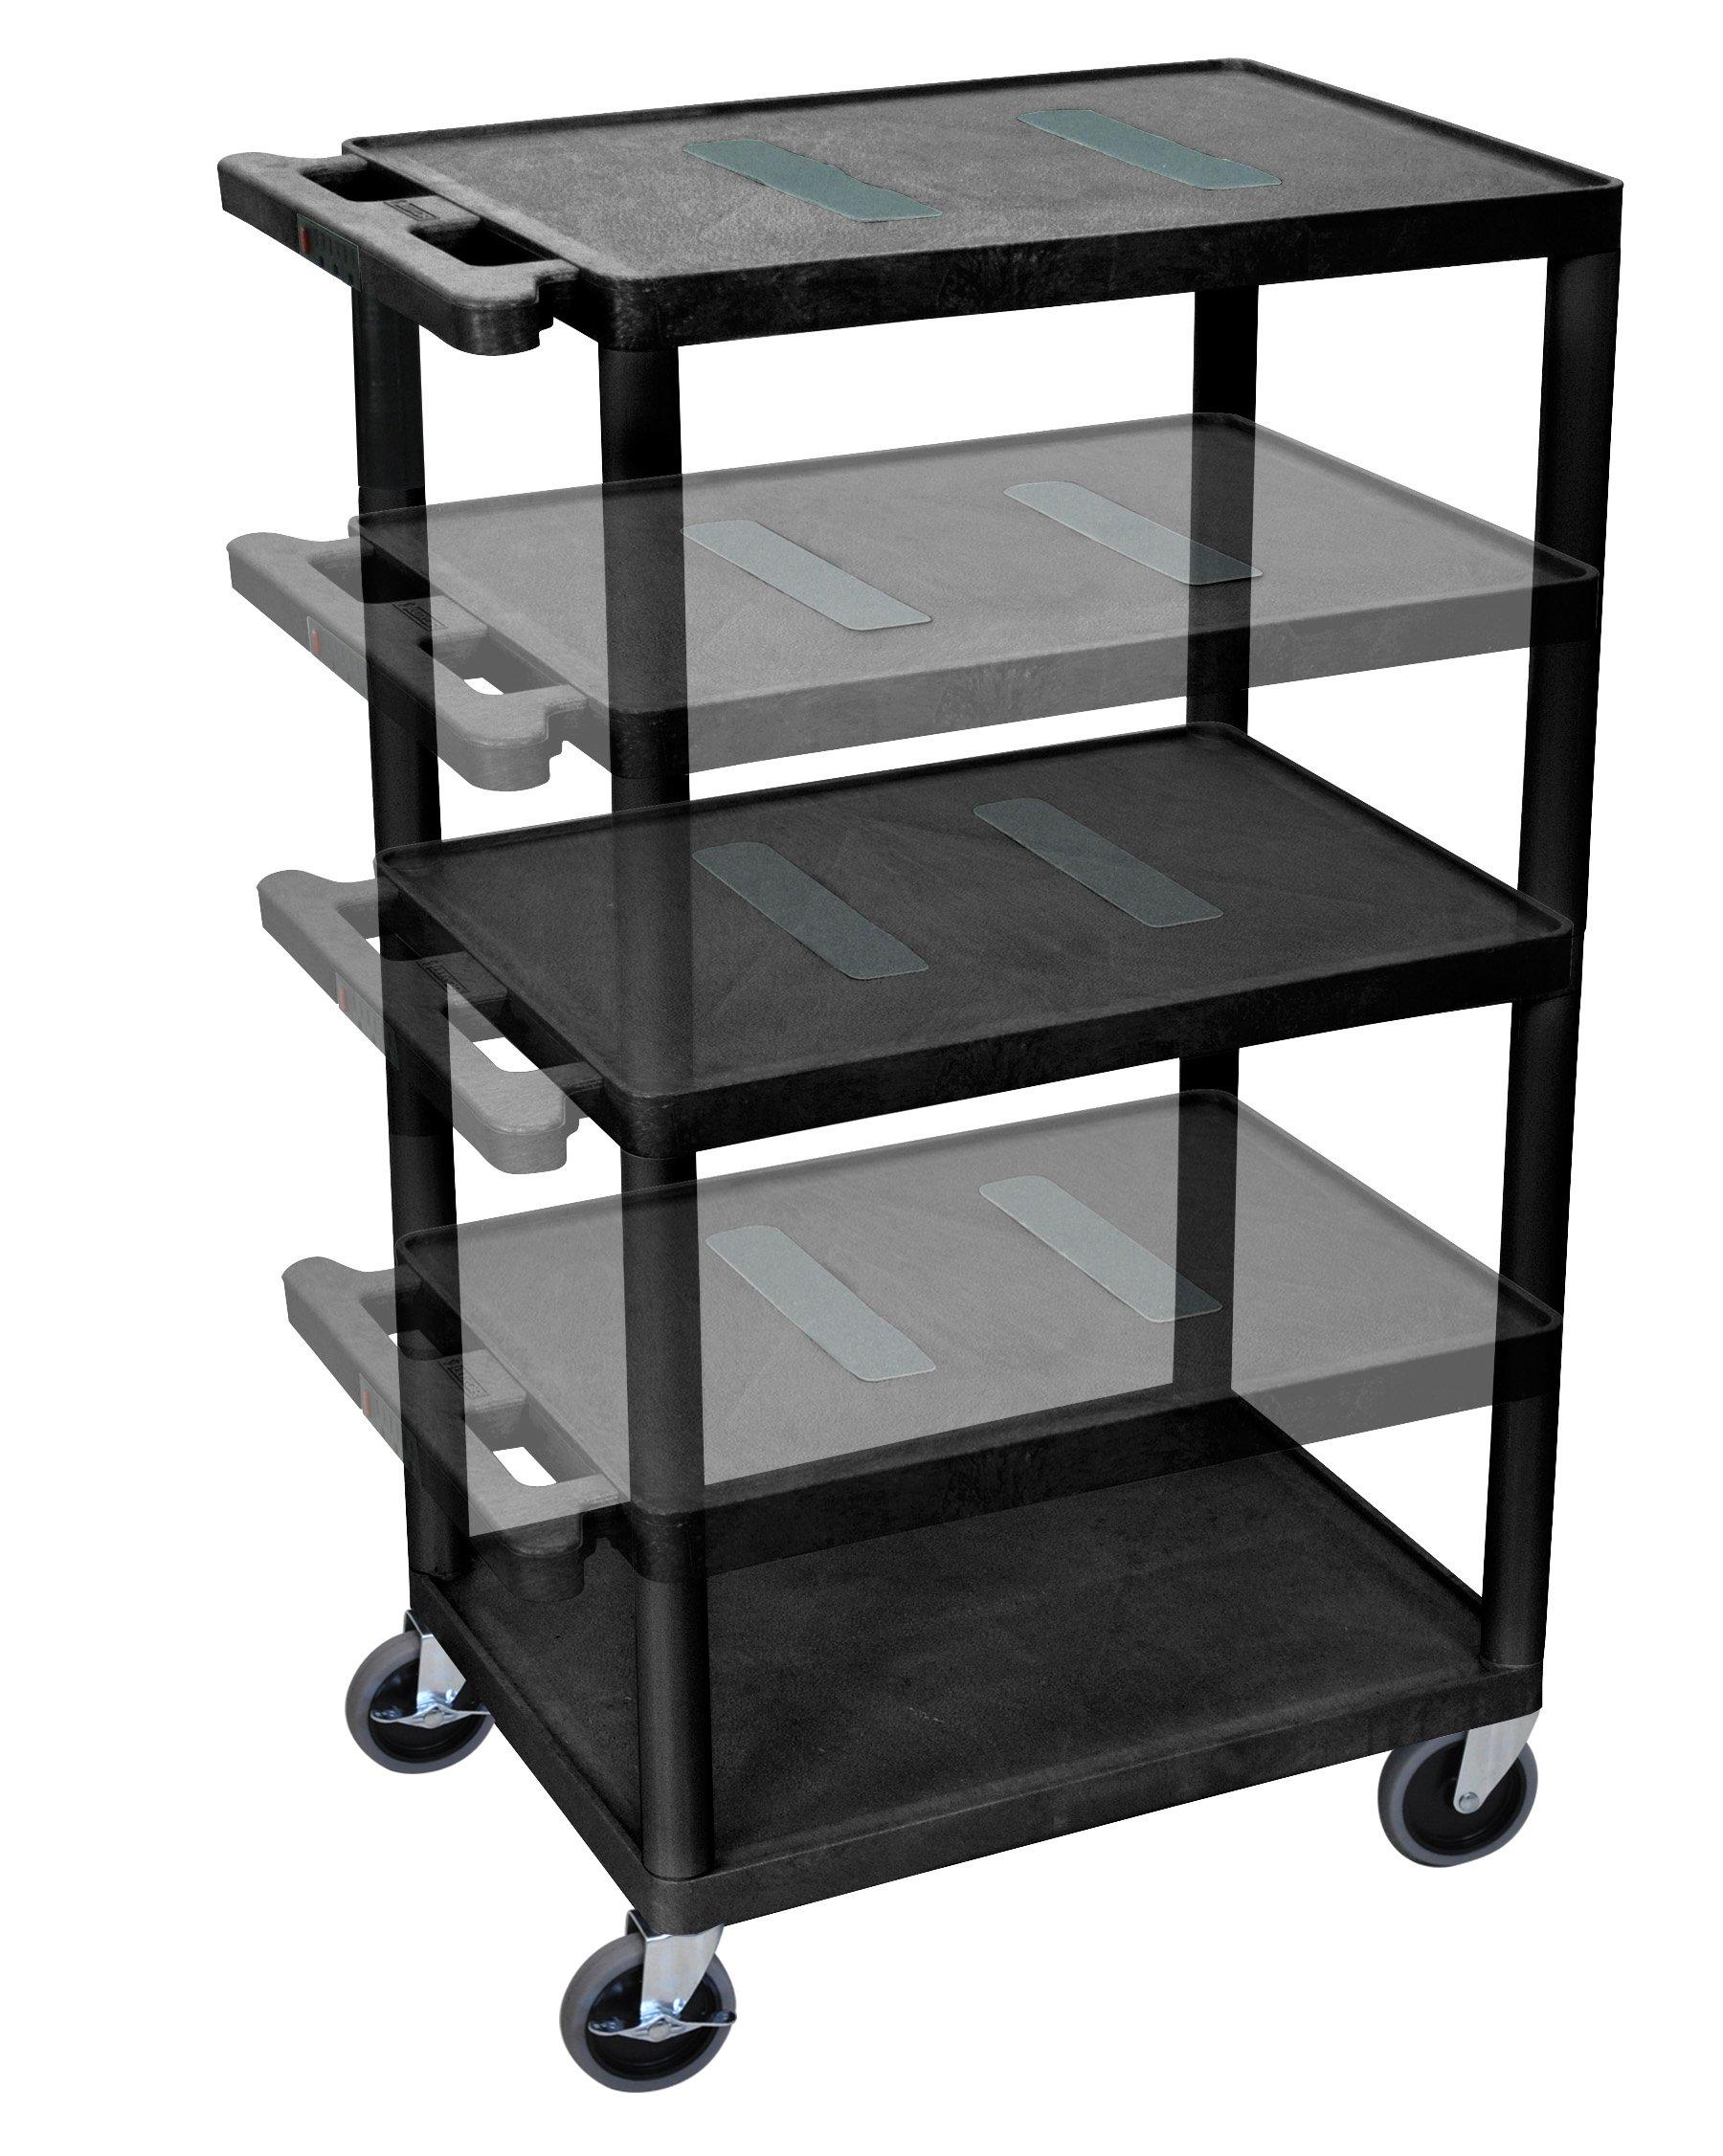 LUXOR LEDUO-B Multi-Height Endura Table, Black